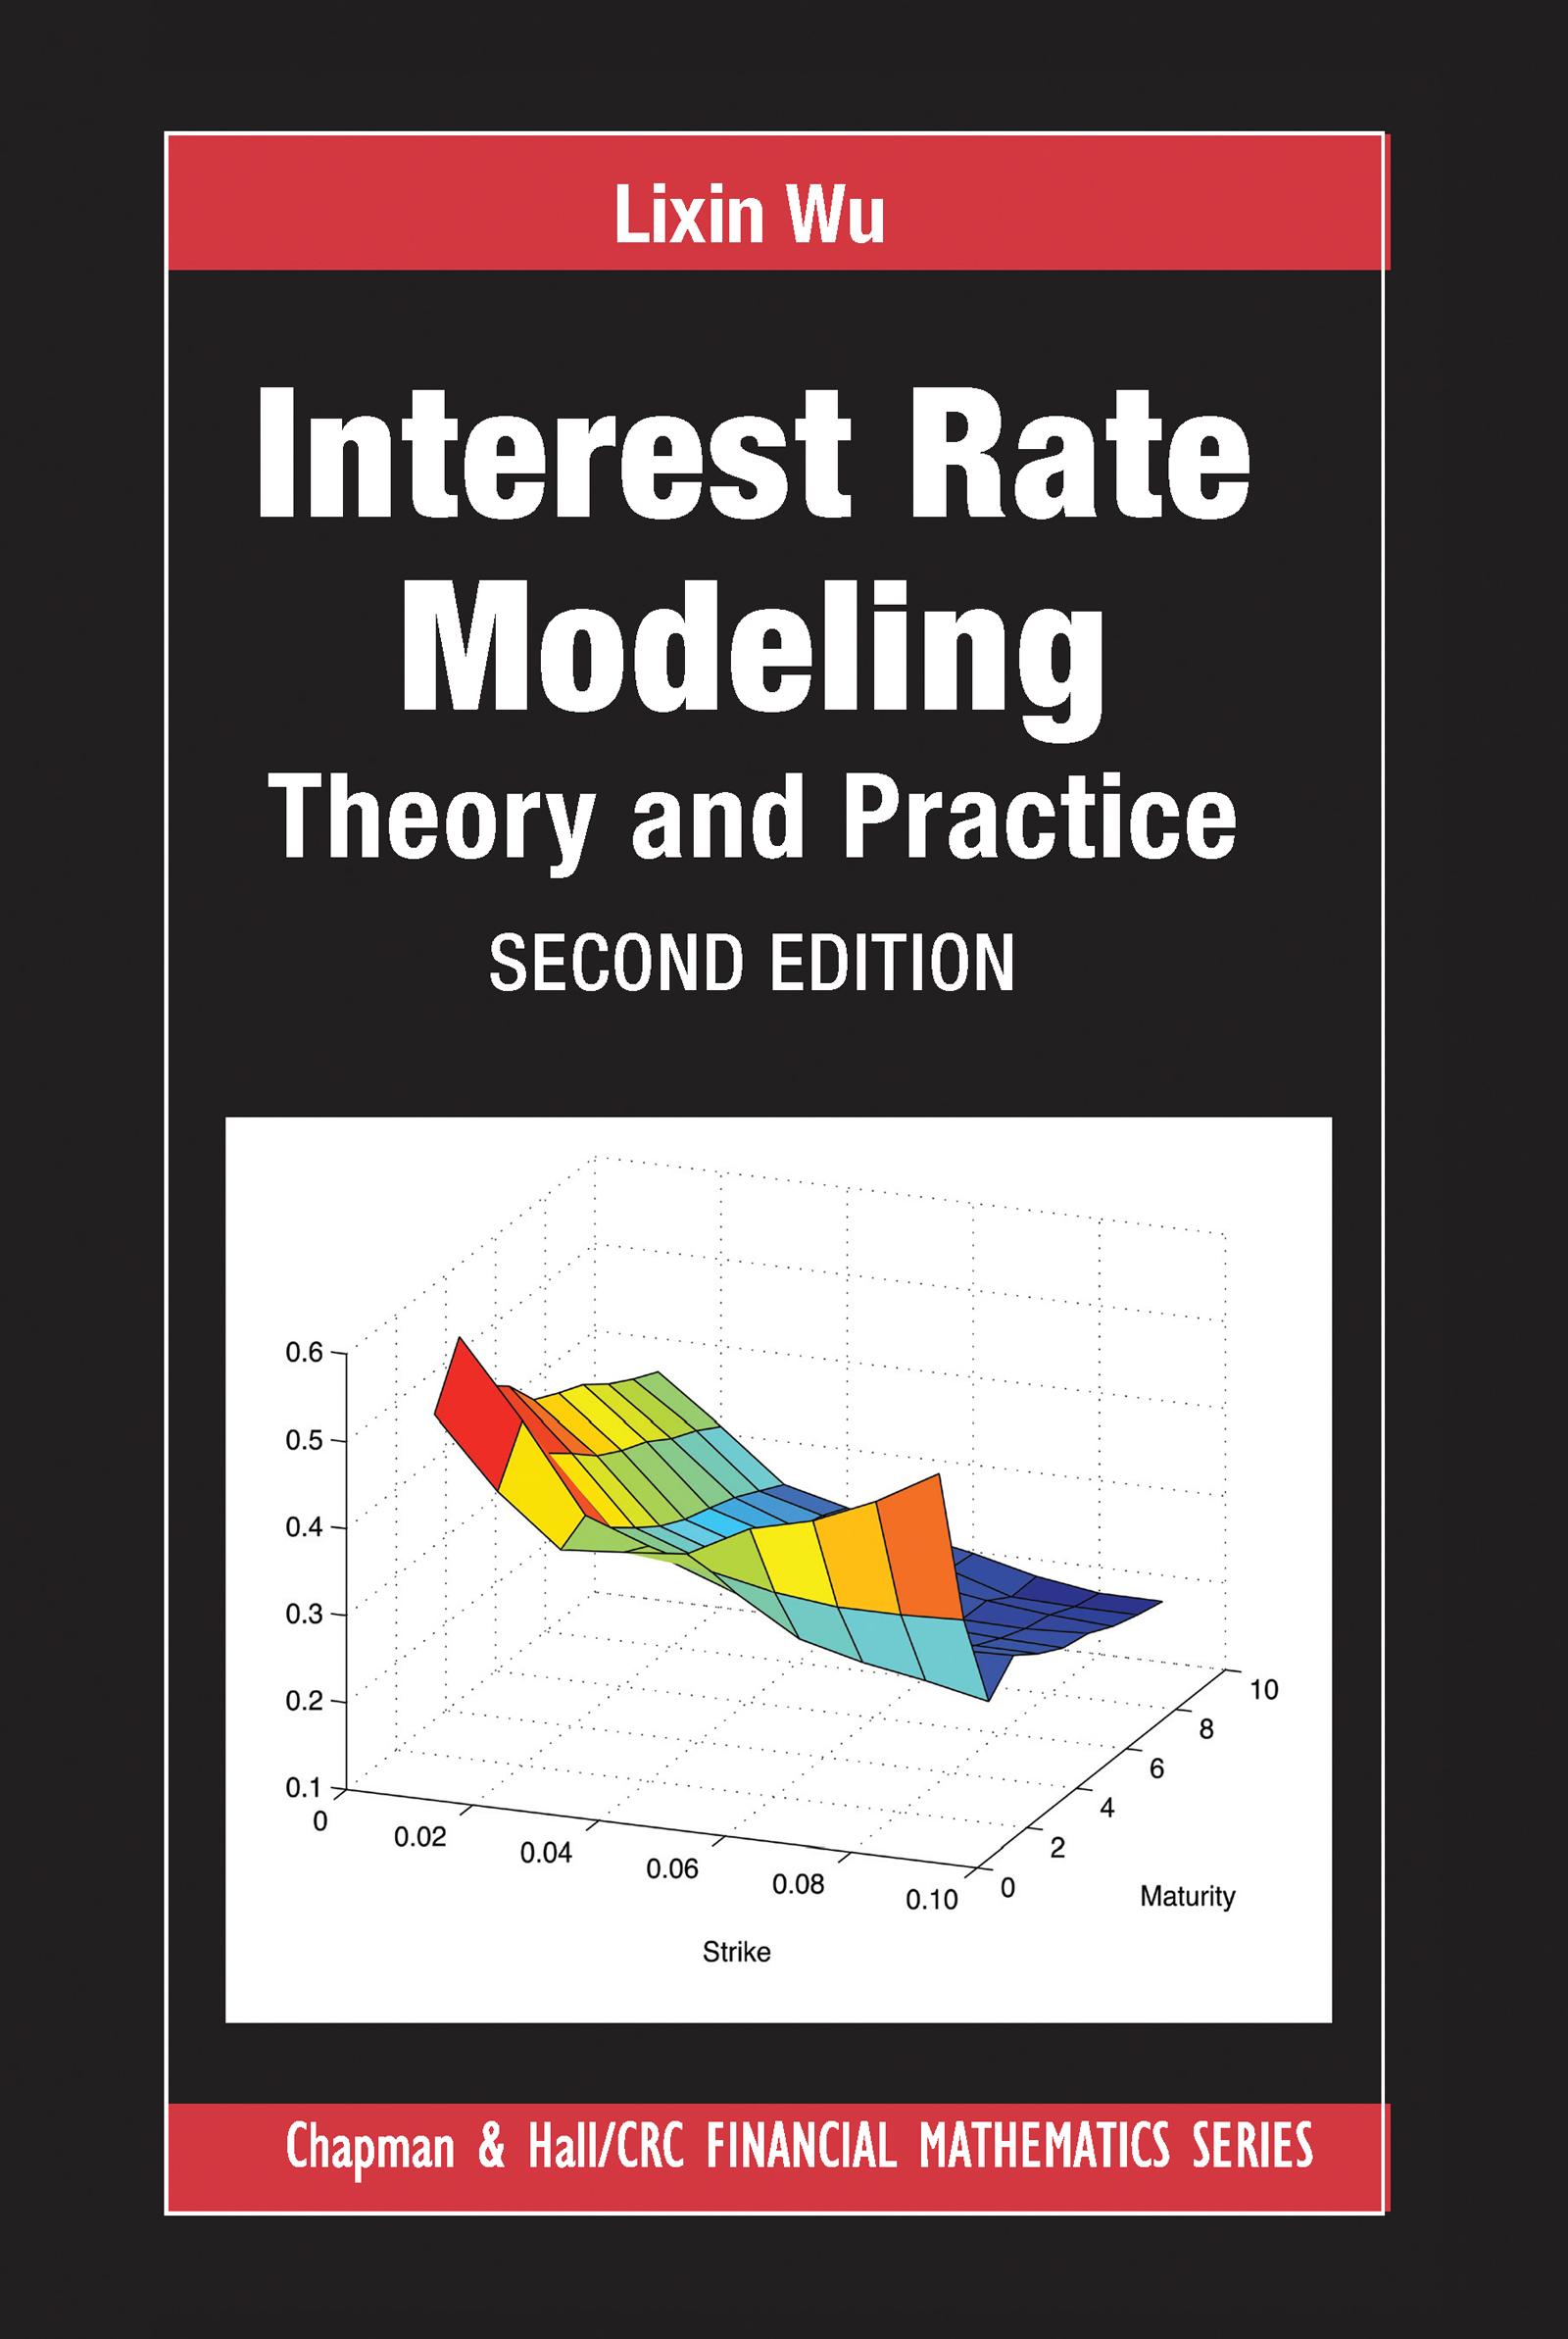 Interest Rate Modeling